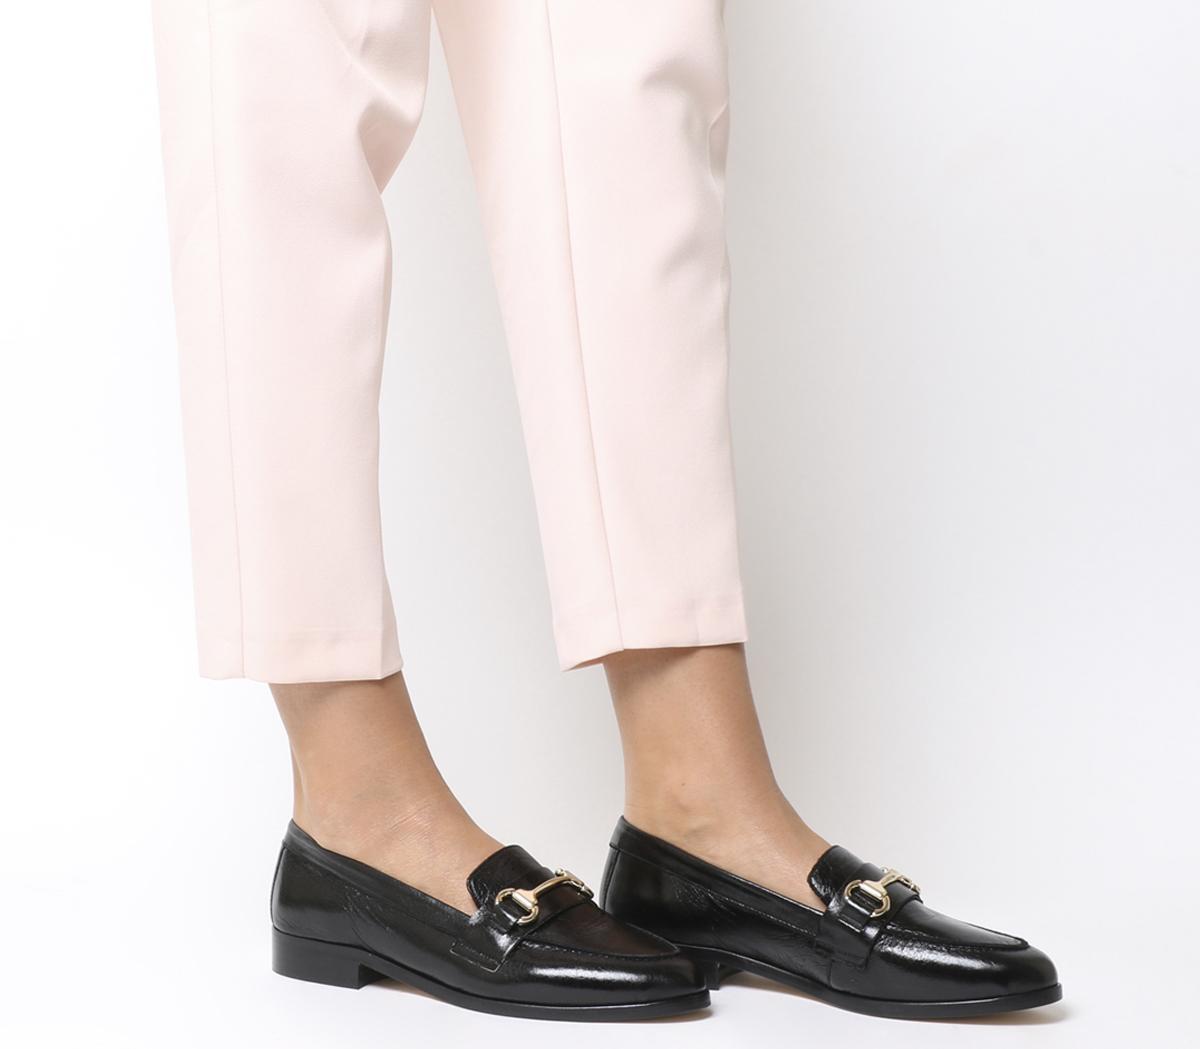 Womens Ladies Black Flat Loafer Pump Work Girls School Office Comfort Shoe Size